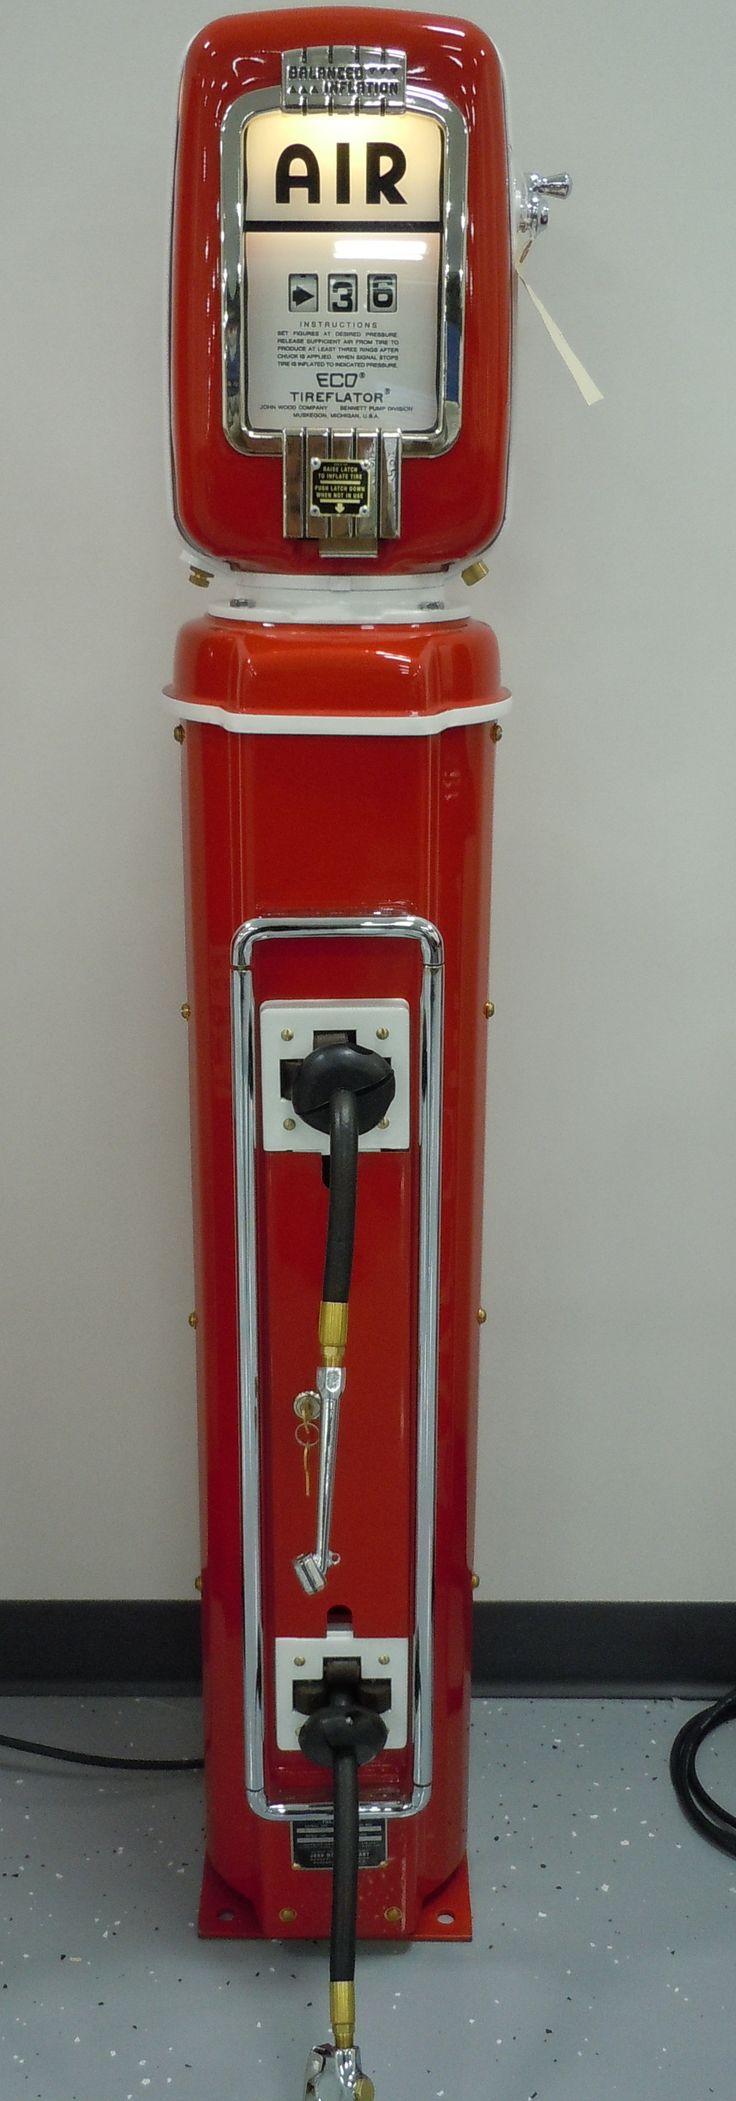 Restored Eco Islander Air Meter. Visit route32restorations.com for pricing